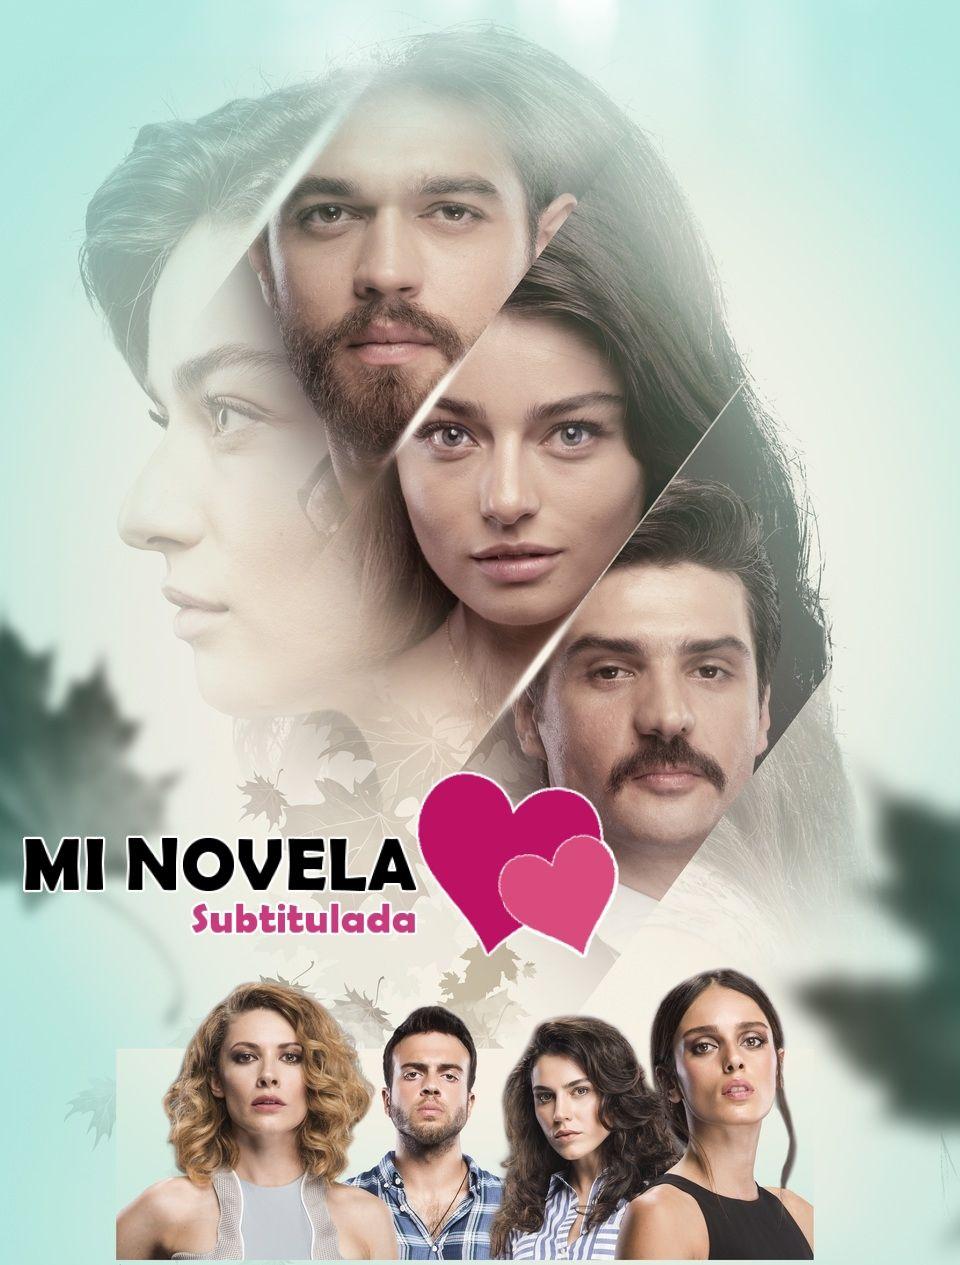 Meryem Capitulos Completos Play Novelas Novelas Series Y Novelas Series Completas En Español